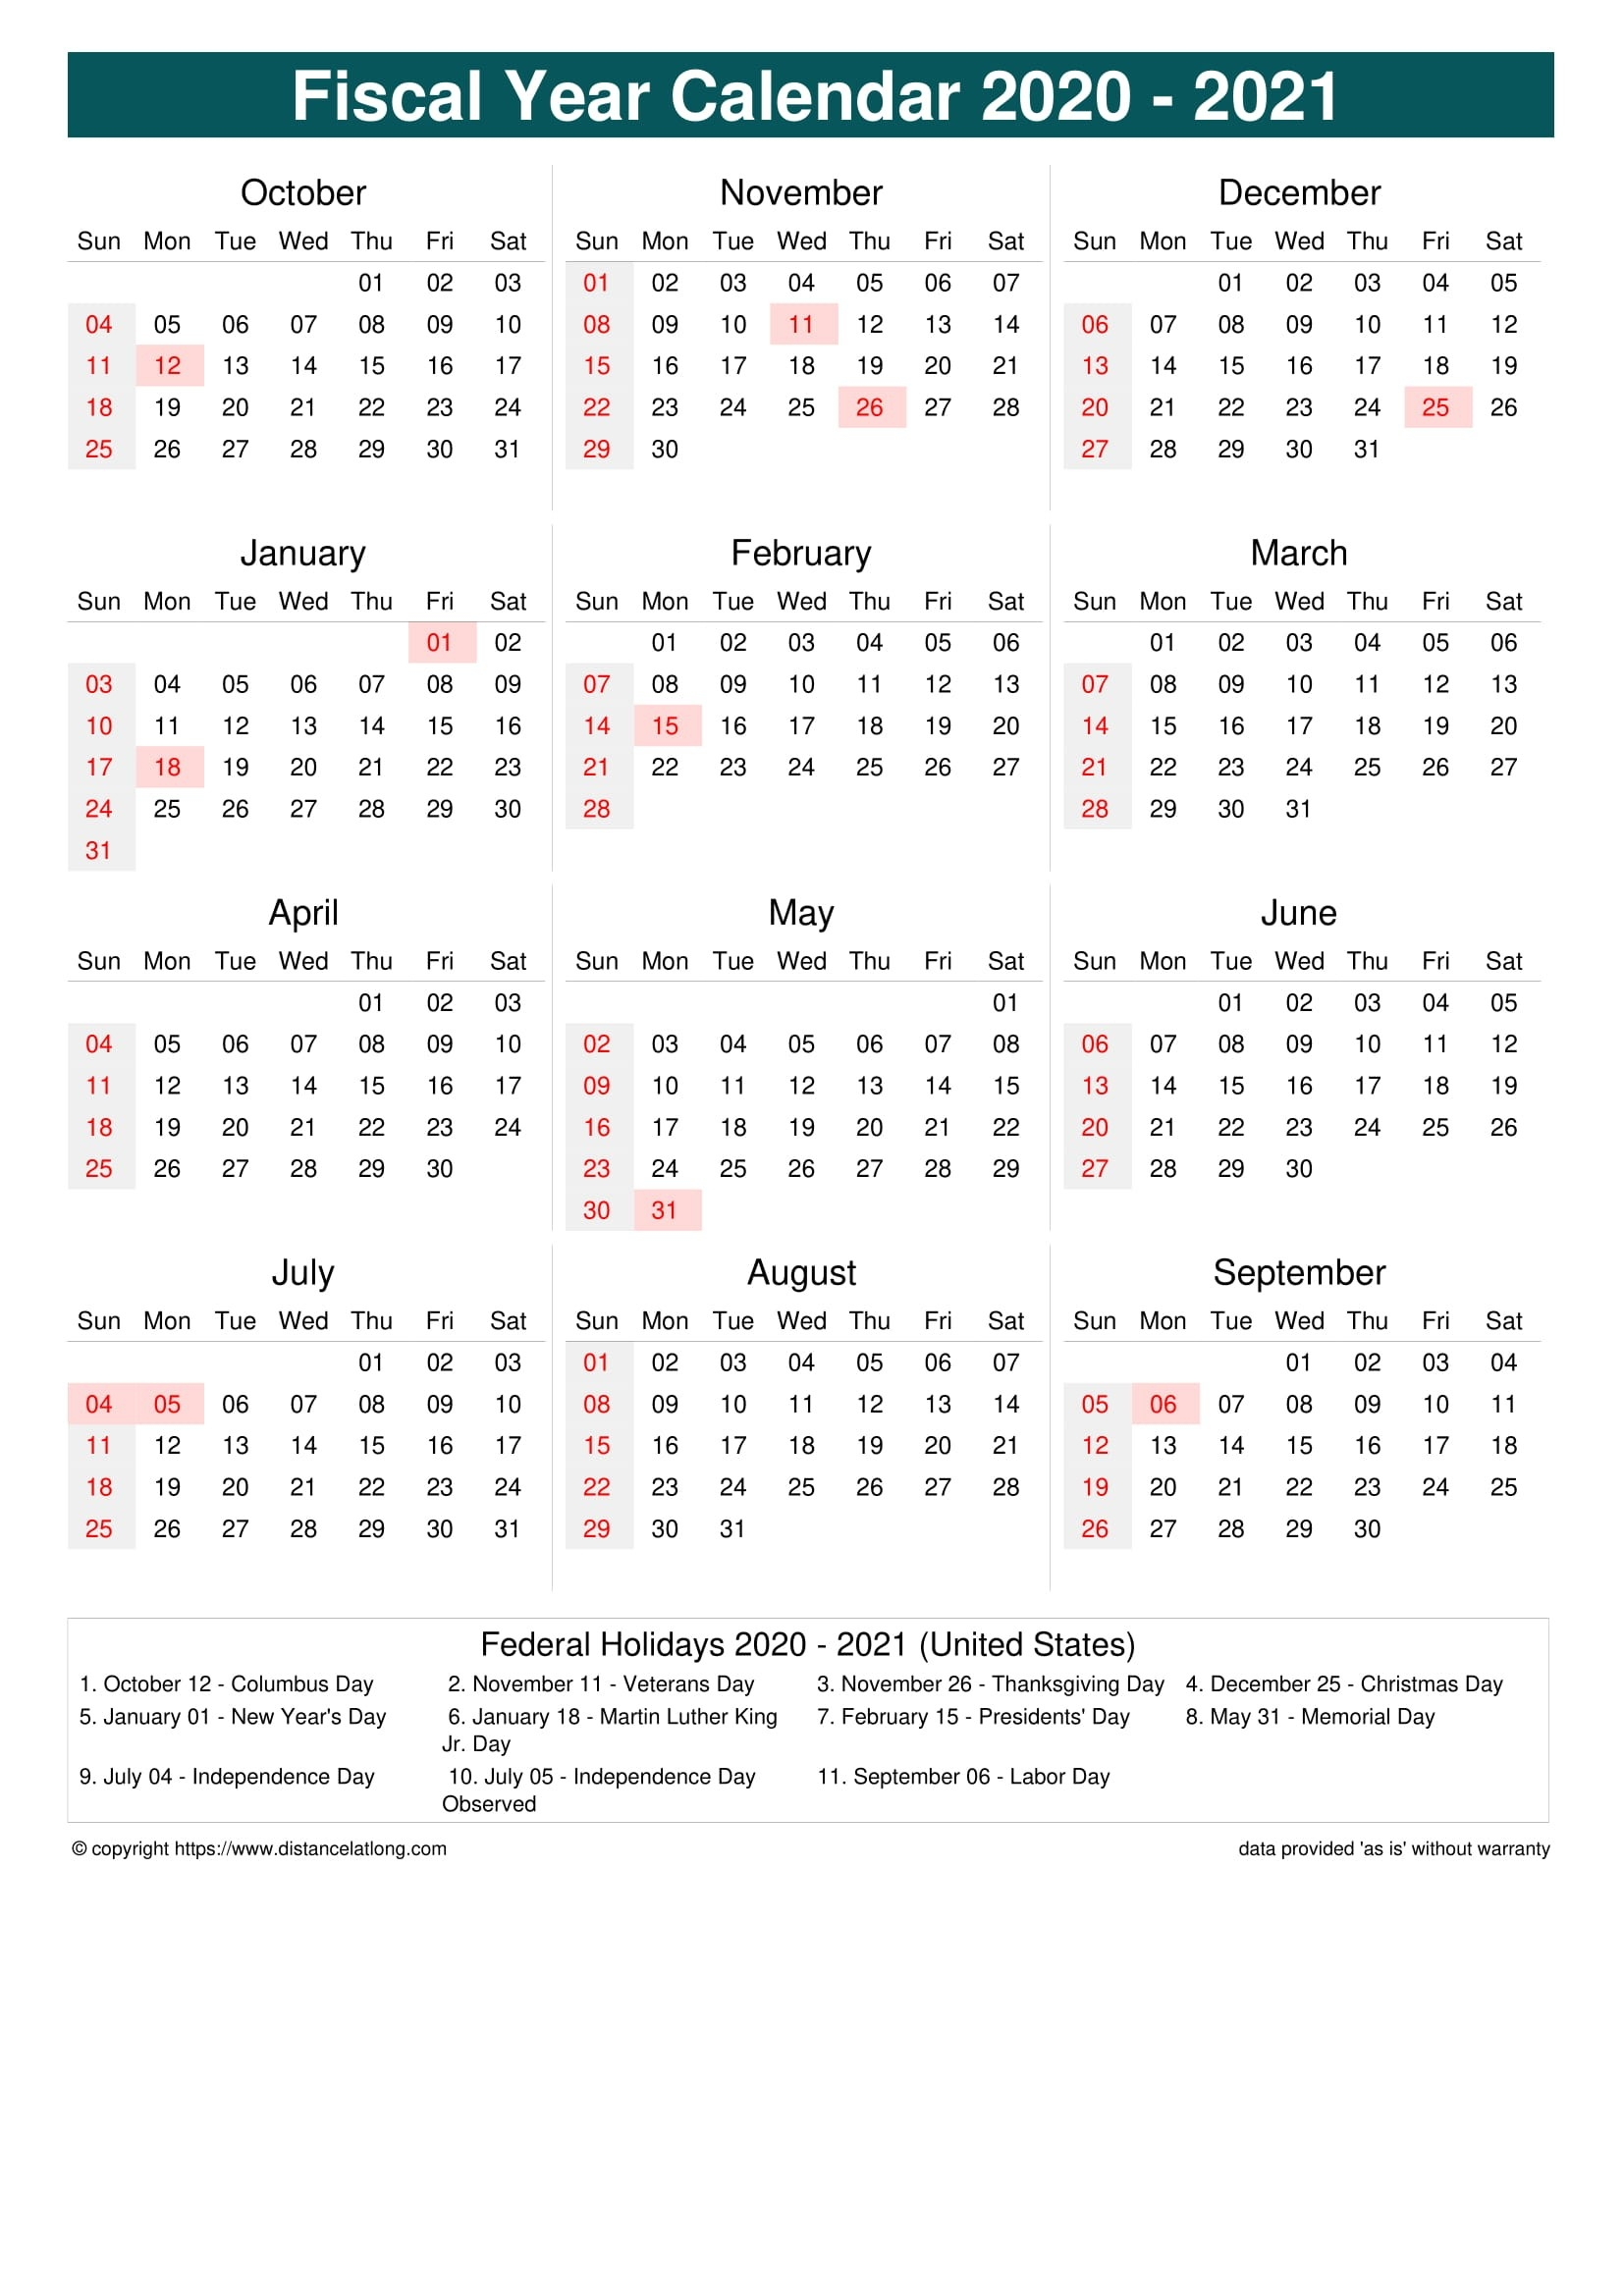 Fiscal Year 2020-2021 Calendar Templates, Free Printable  Calendar 2021 2021 Financial Year